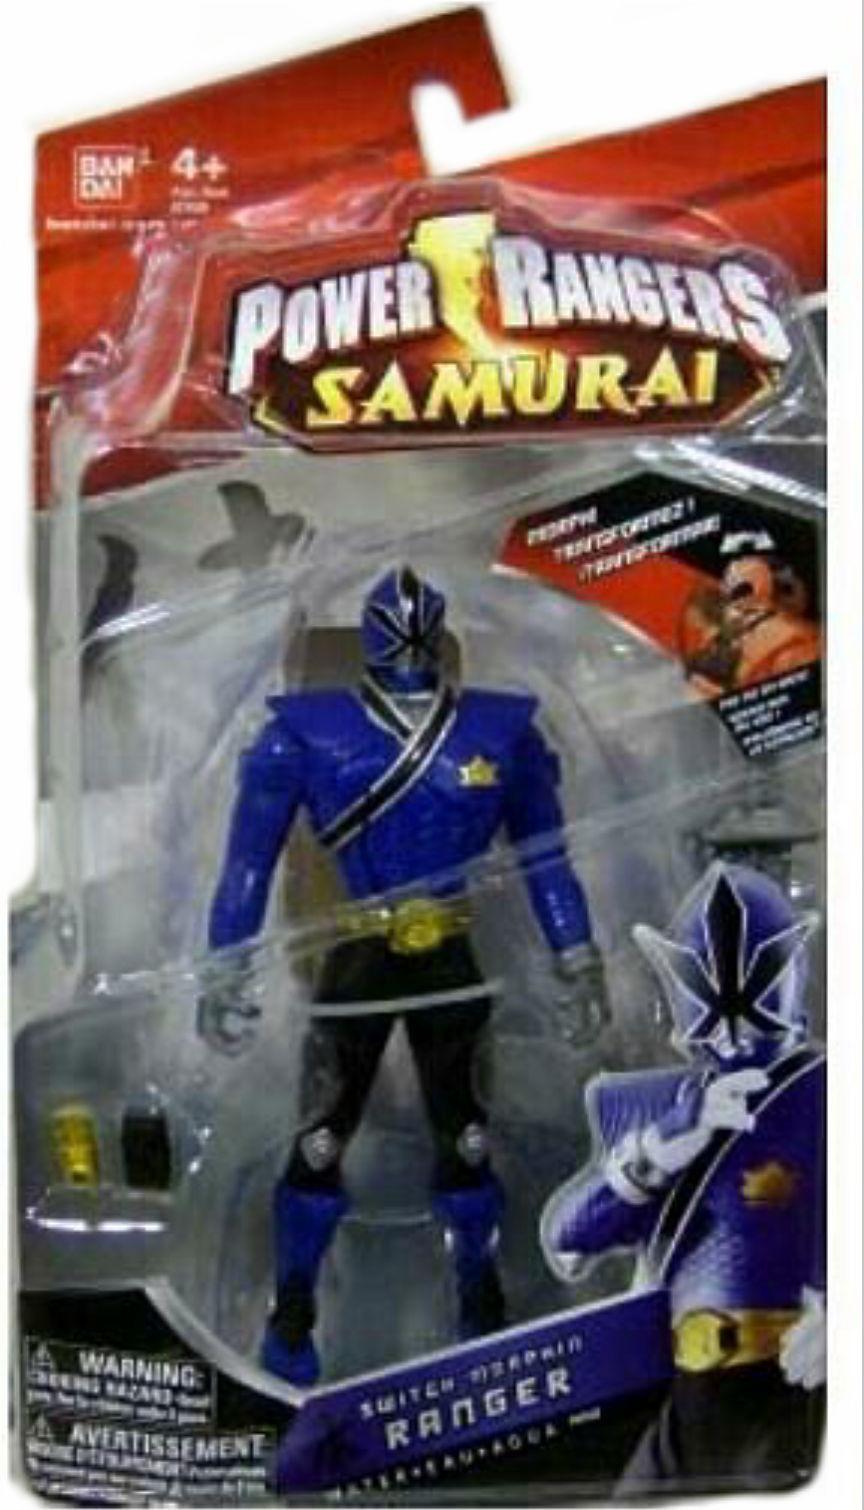 Power rangers samurai 7  switch morphin blaue ranger neue fabrik versiegelt 2011